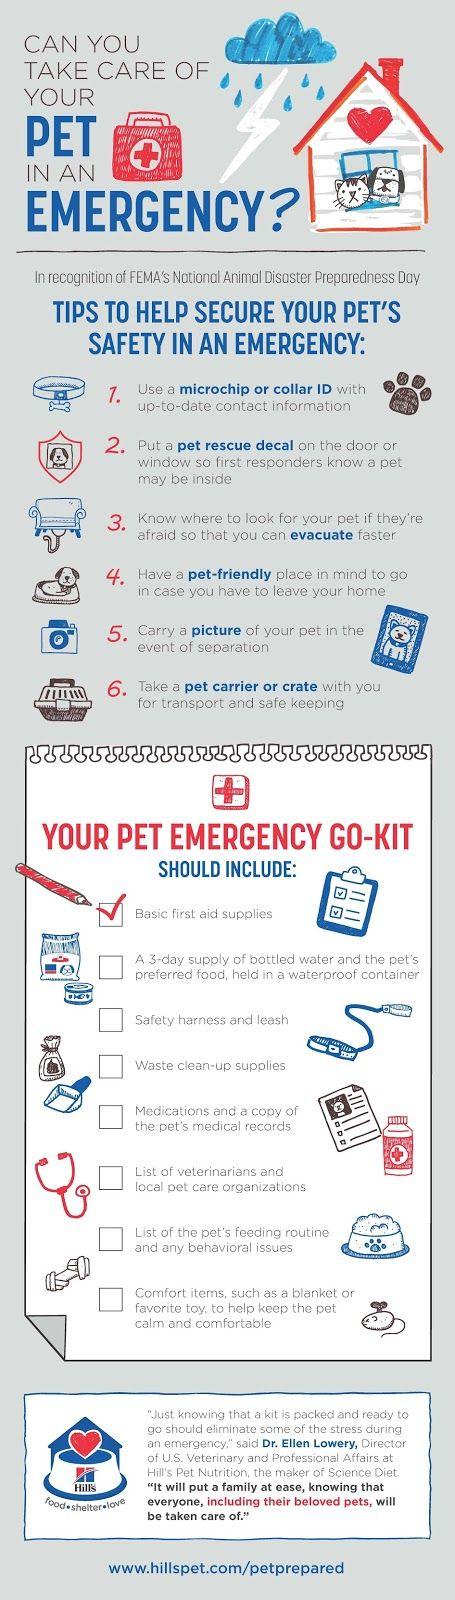 Be #PetPrepared! Include Pets In Family Disaster Preparedness Plans @HillsPet #sponsored